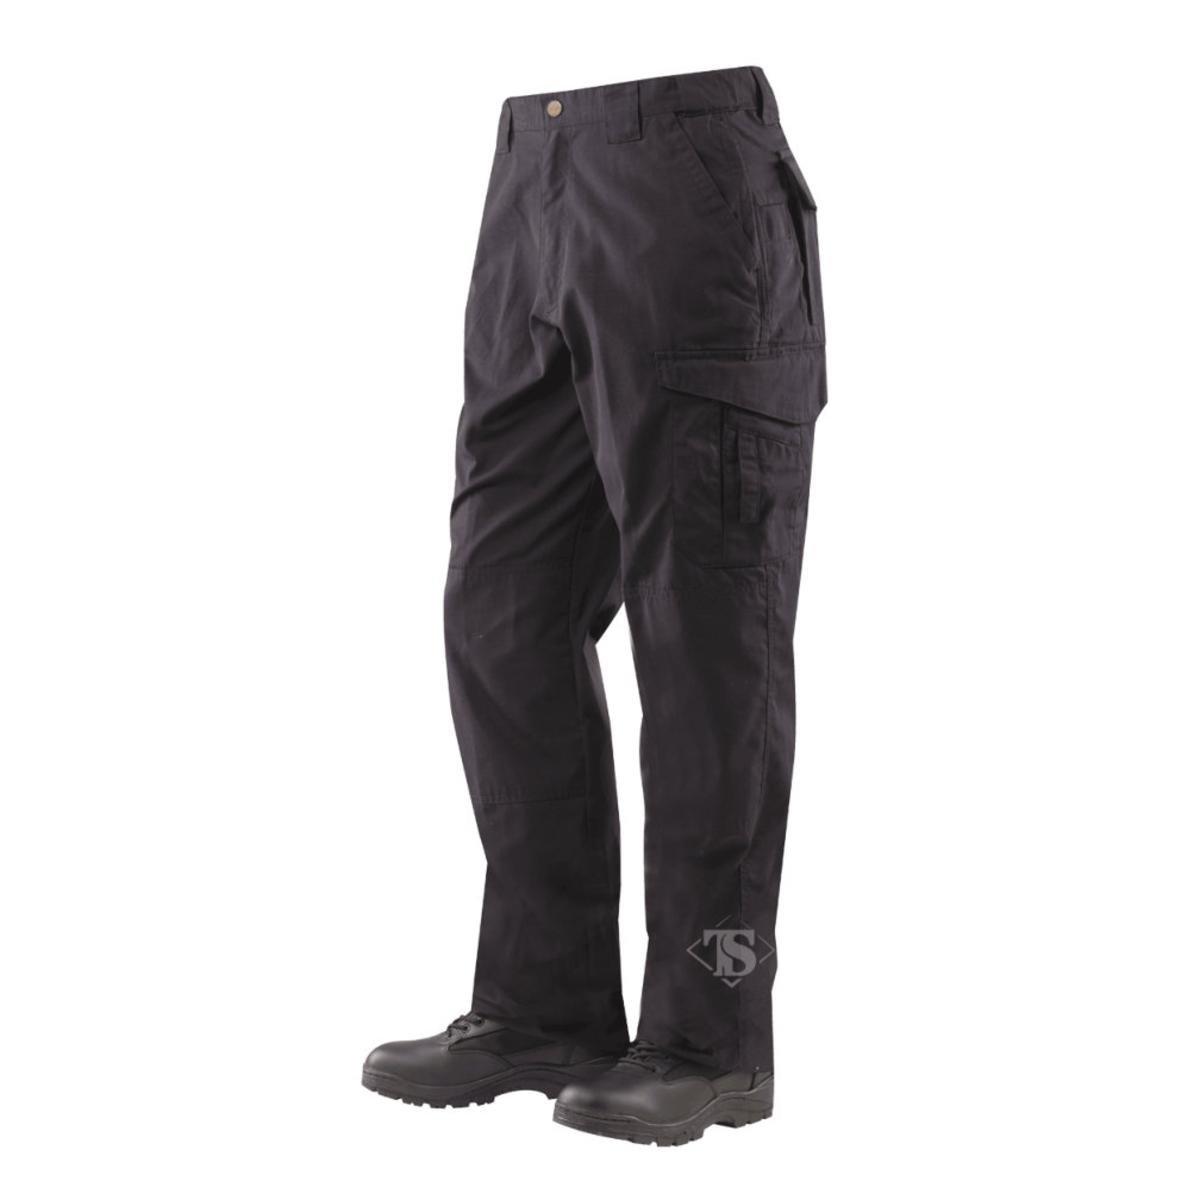 Tru-Spec Men's 24-7 Series EMS Pant, Black, 40W Unhemmed